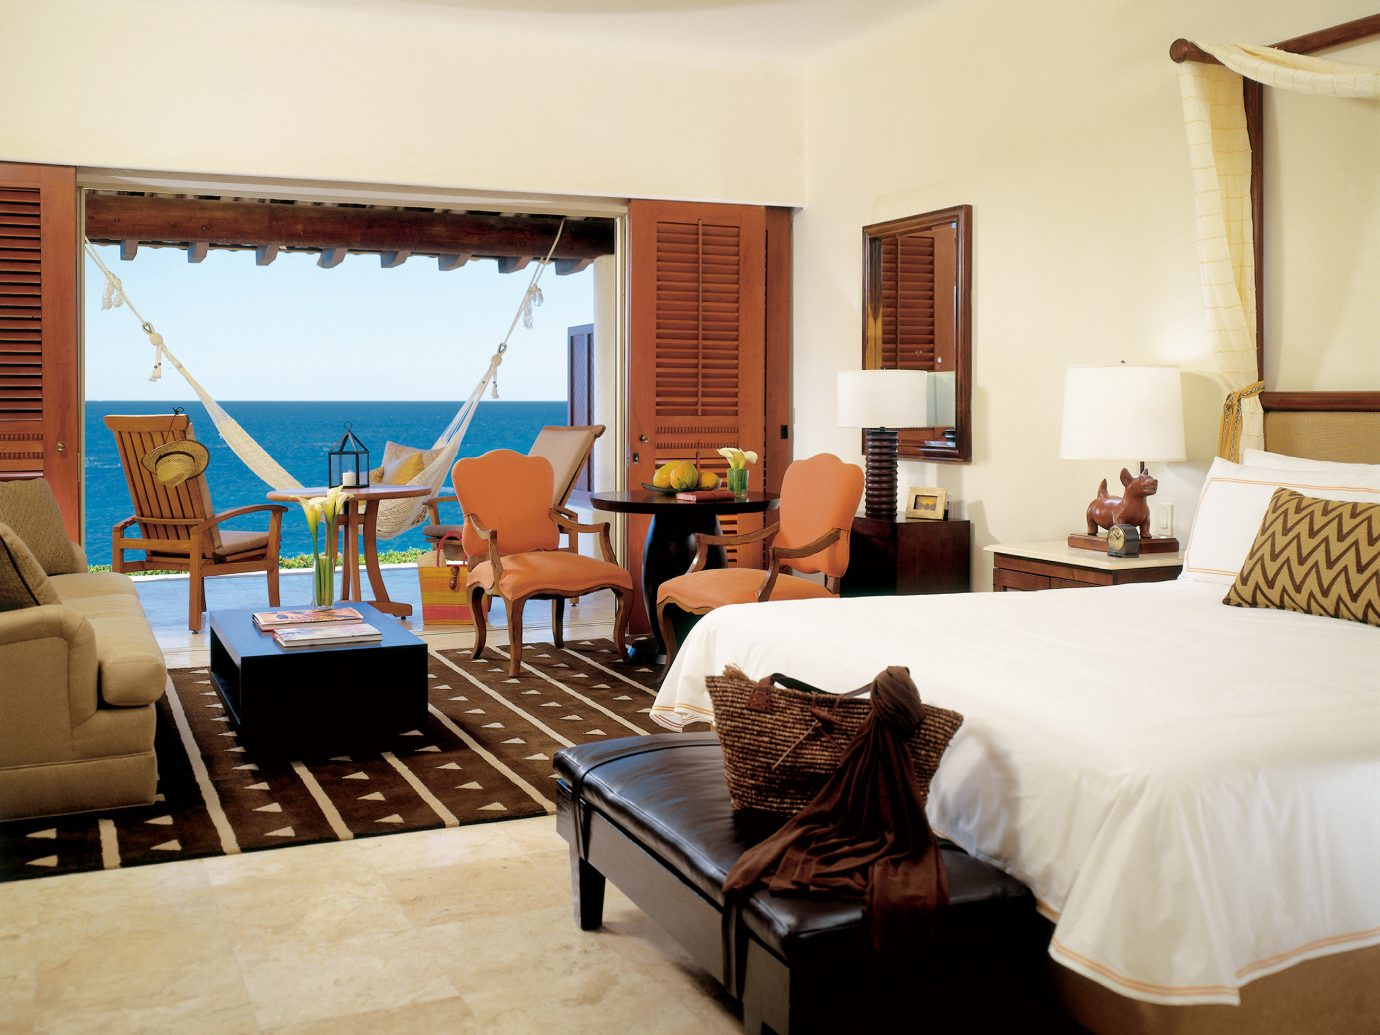 bedroom at Four Seasons Resort Punta Mita, Mexico